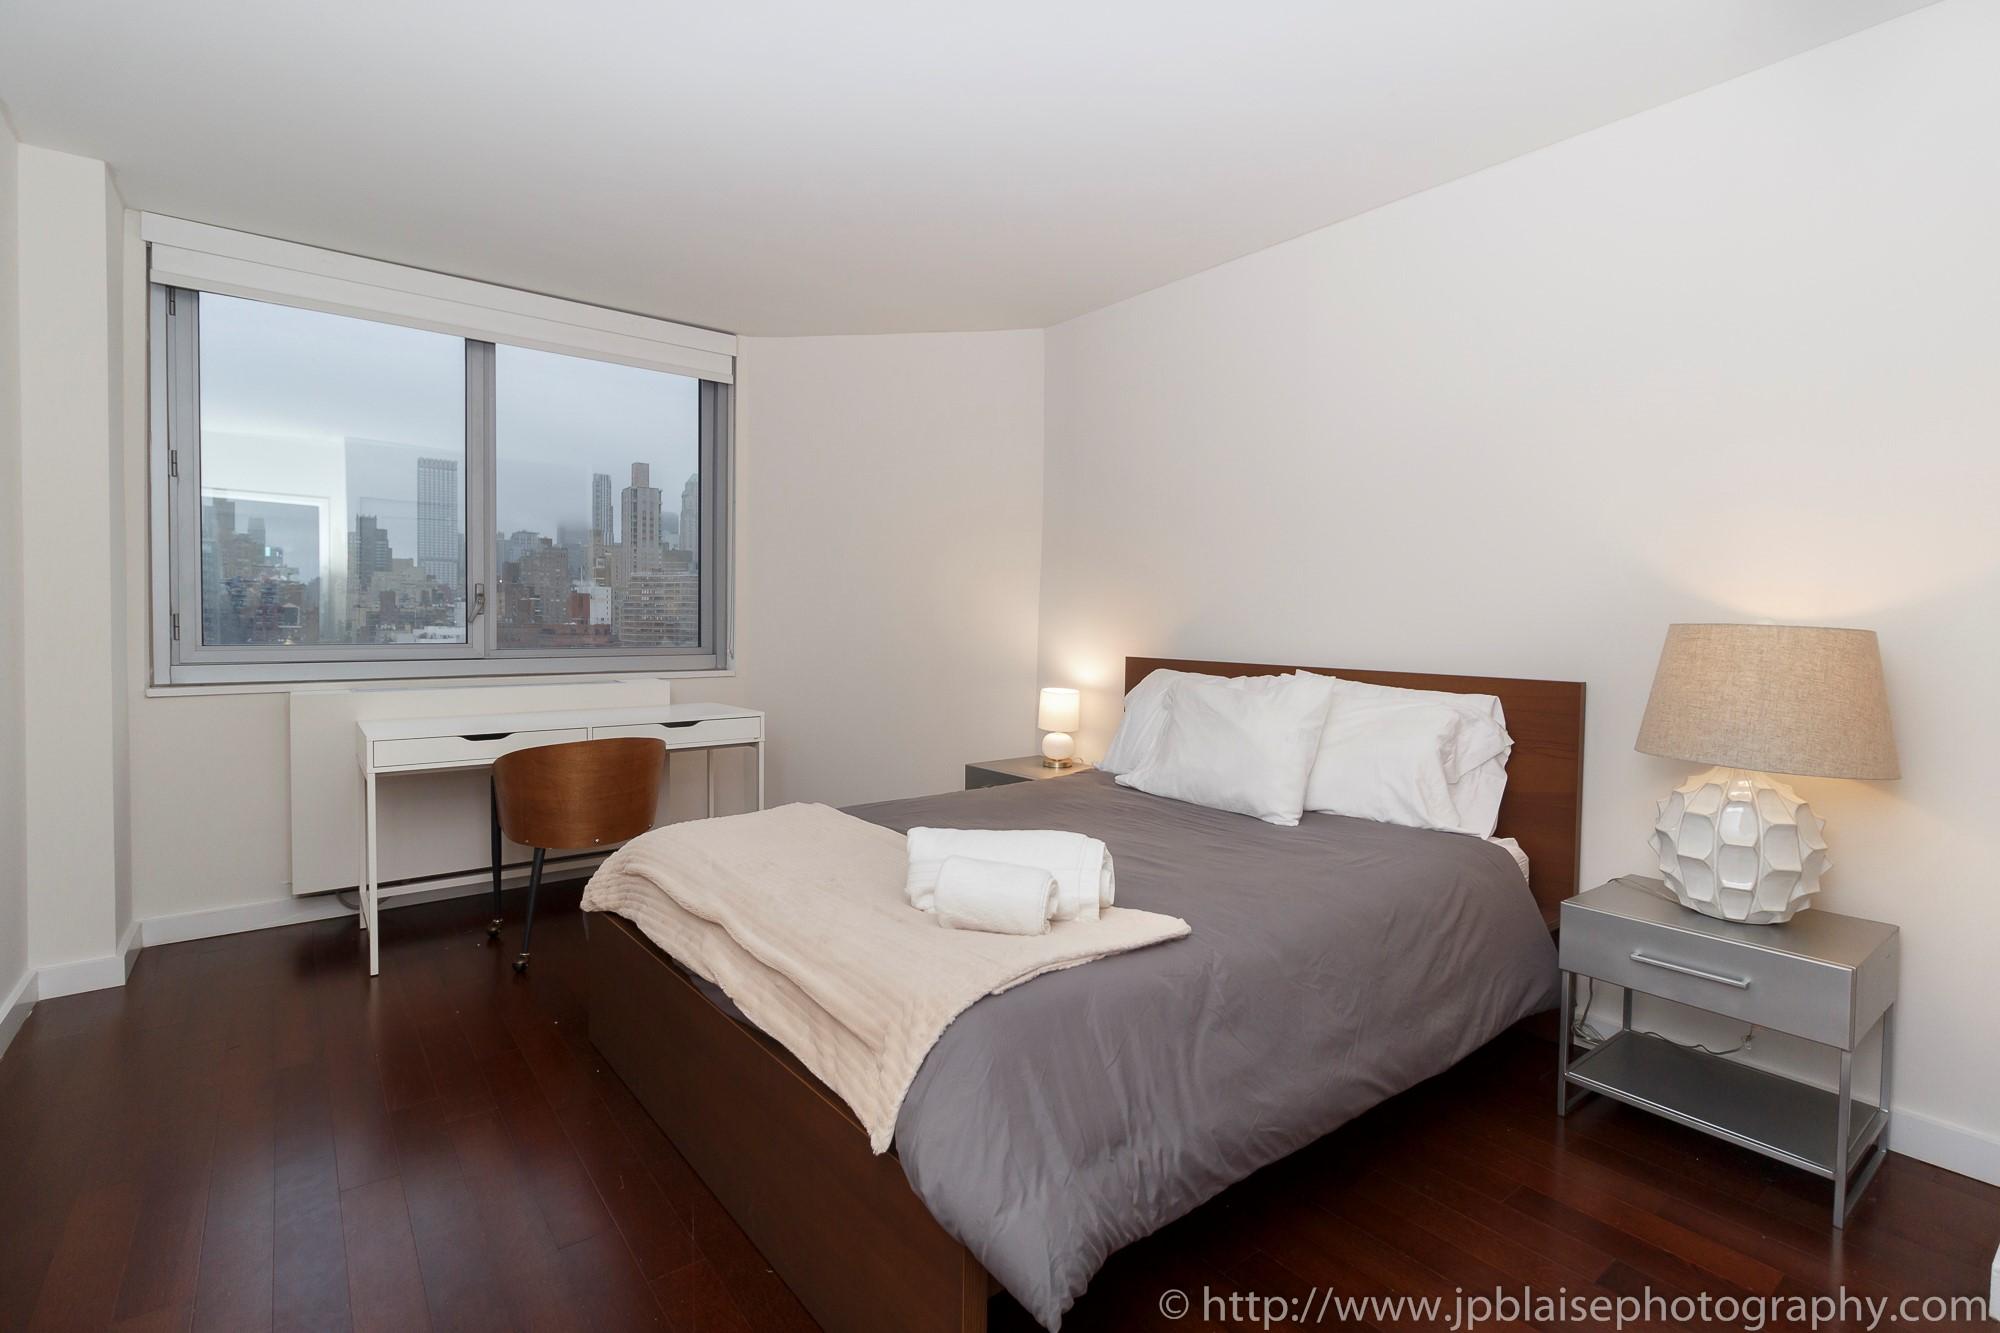 Astonishing Ny Apartment Photographer Work Modern 3 Bedroom 2 Download Free Architecture Designs Rallybritishbridgeorg